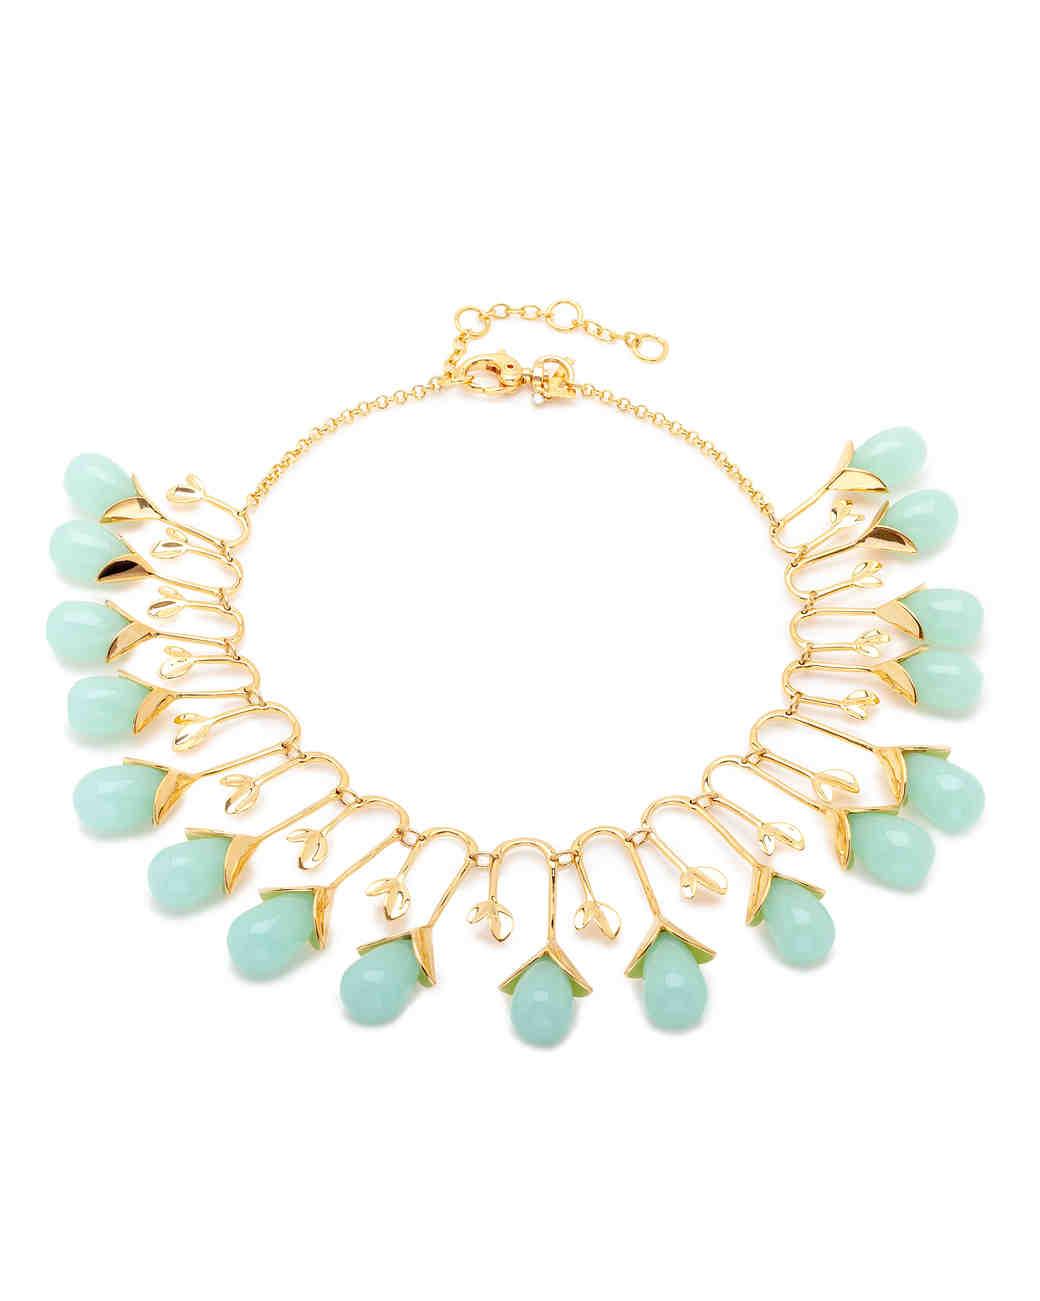 something-blue-jewelry-leles-1215.jpg